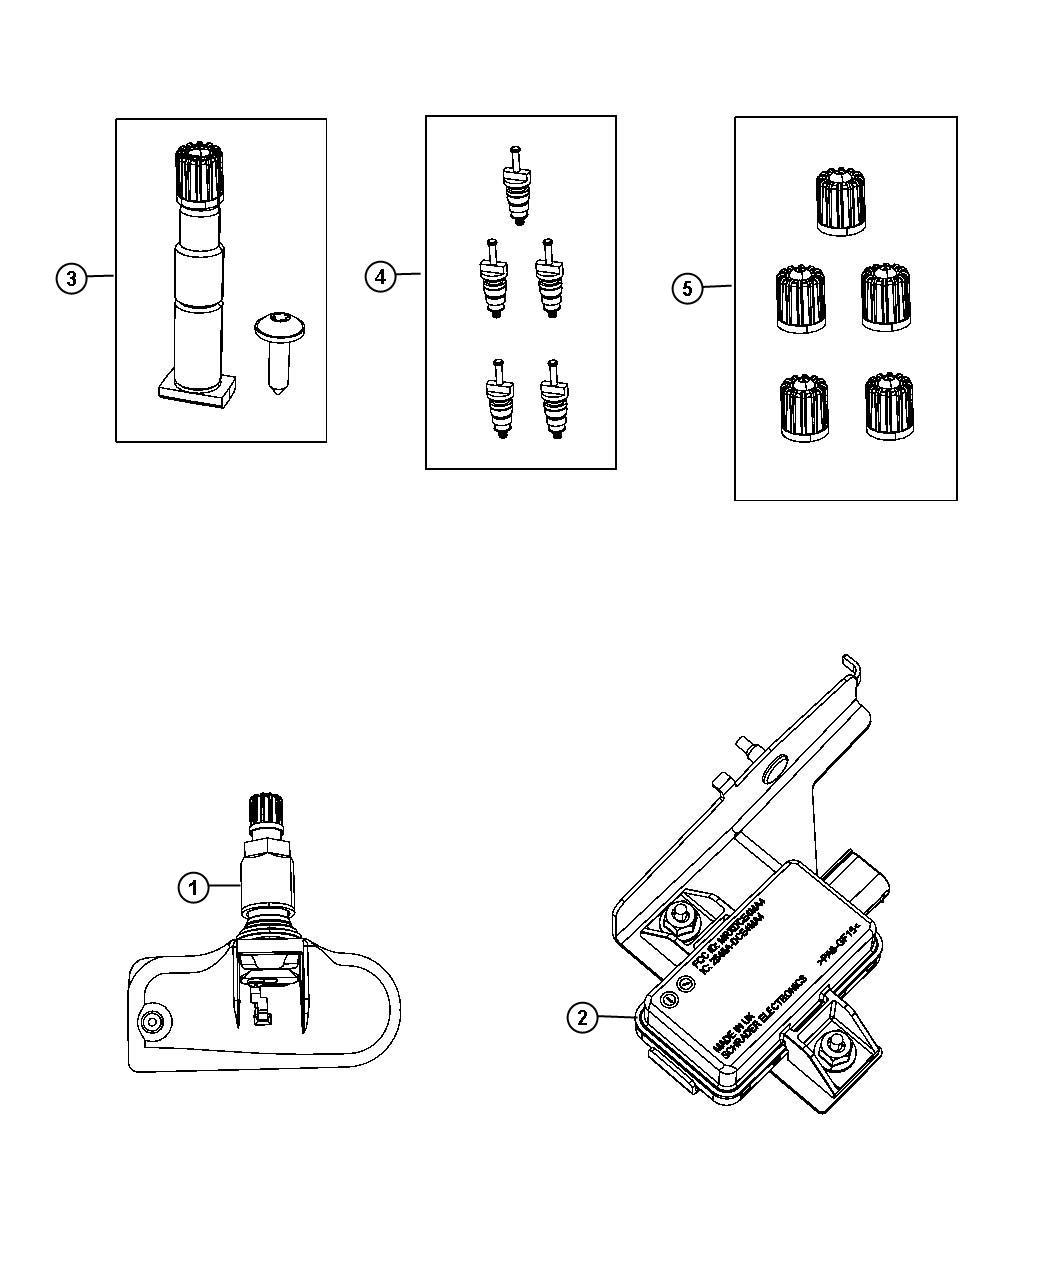 Audi A4 Relay Diagram - Wiring Diagrams List